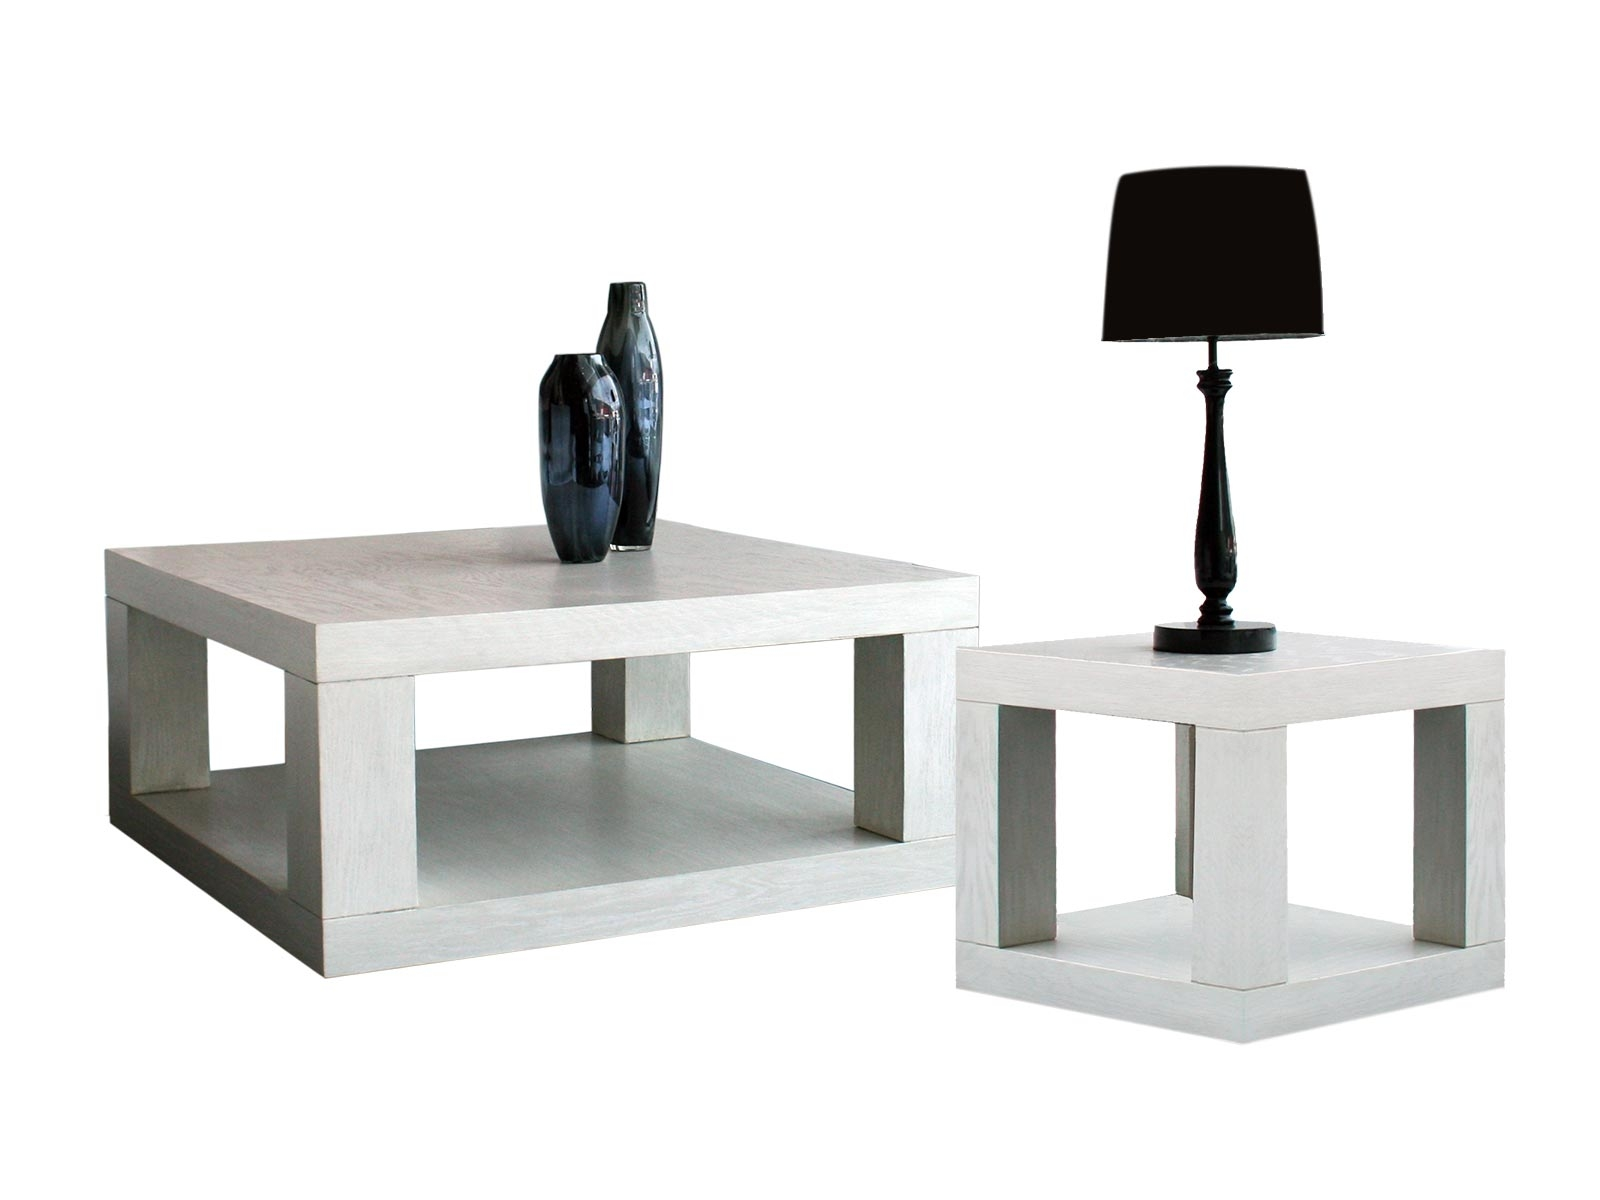 Mesa de sala dutti centro y lateral cuadrada grupo umma for Mesas de centro de sala de vidrio